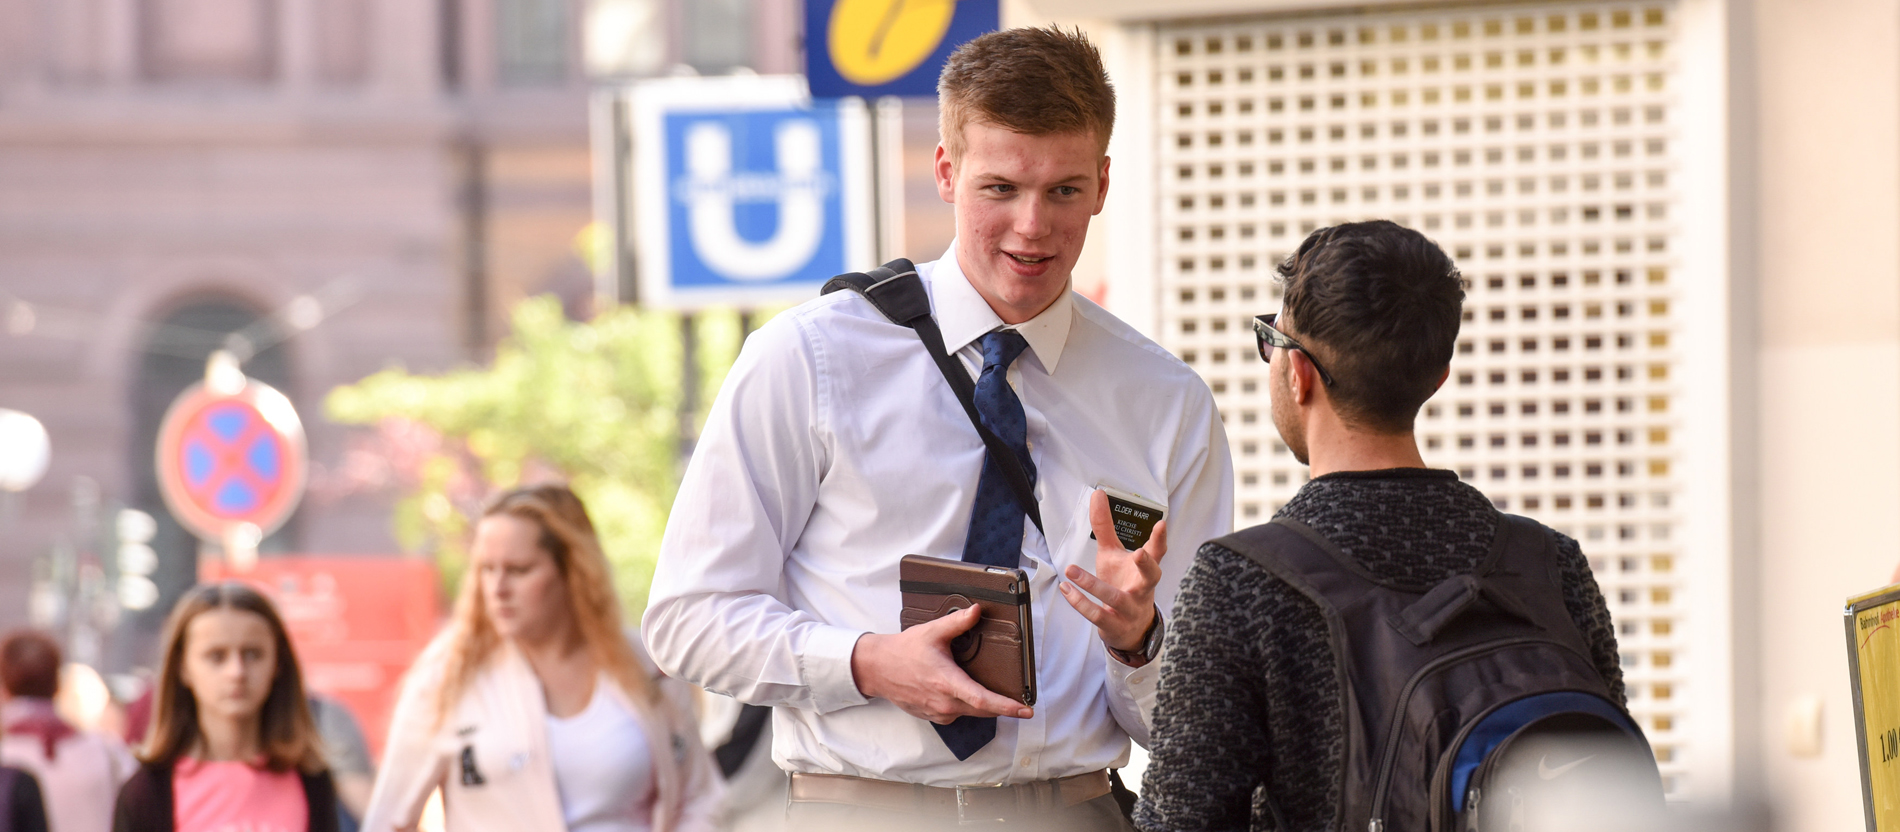 Mormonen In Deutschland Regeln